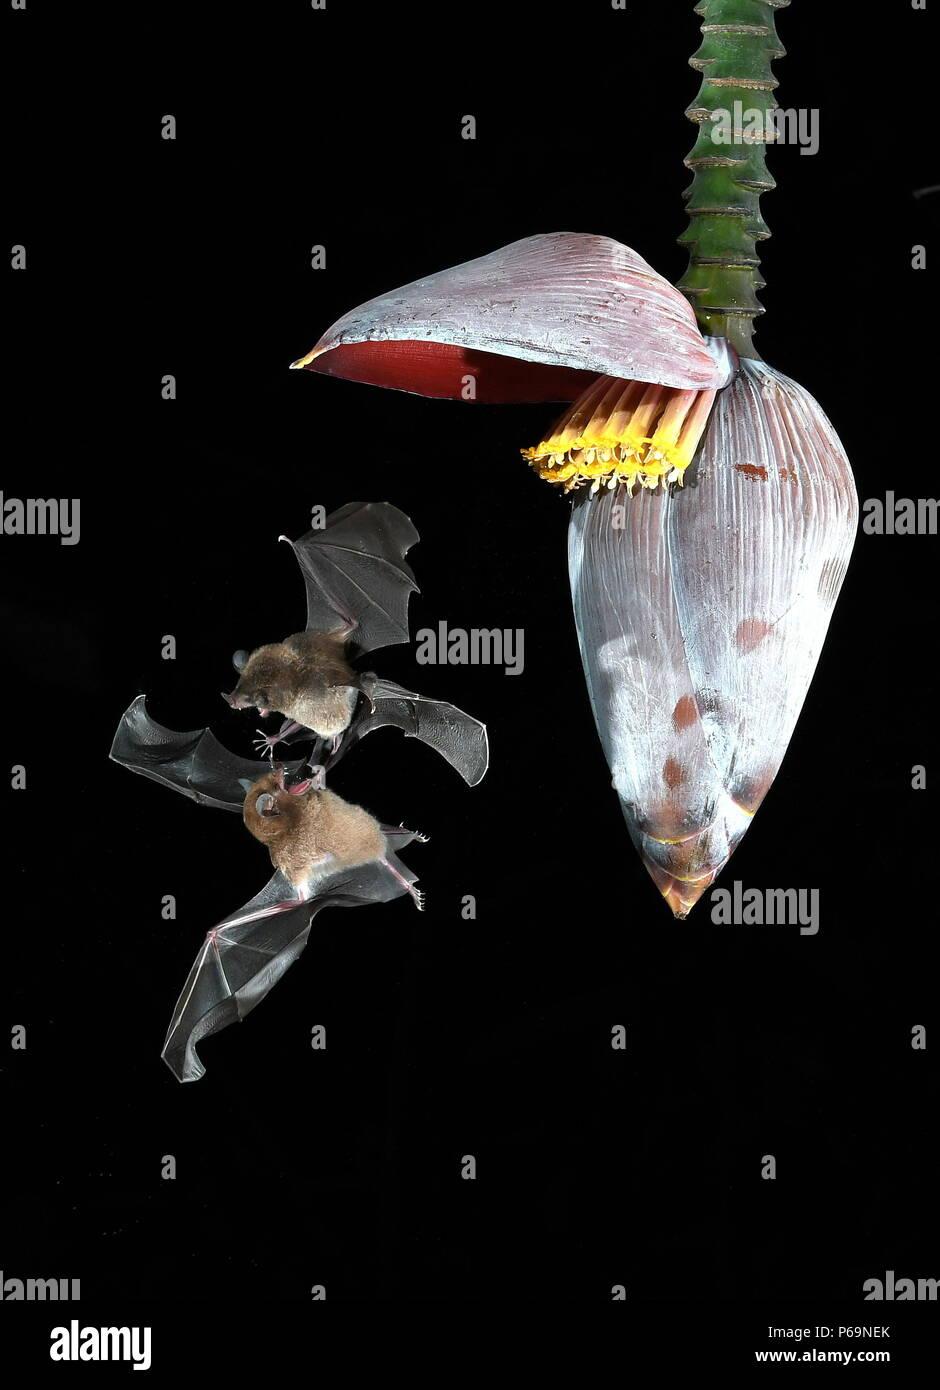 A duo of tent-making bats (Uroderma bilobatum) duels for night nectar - Stock Image